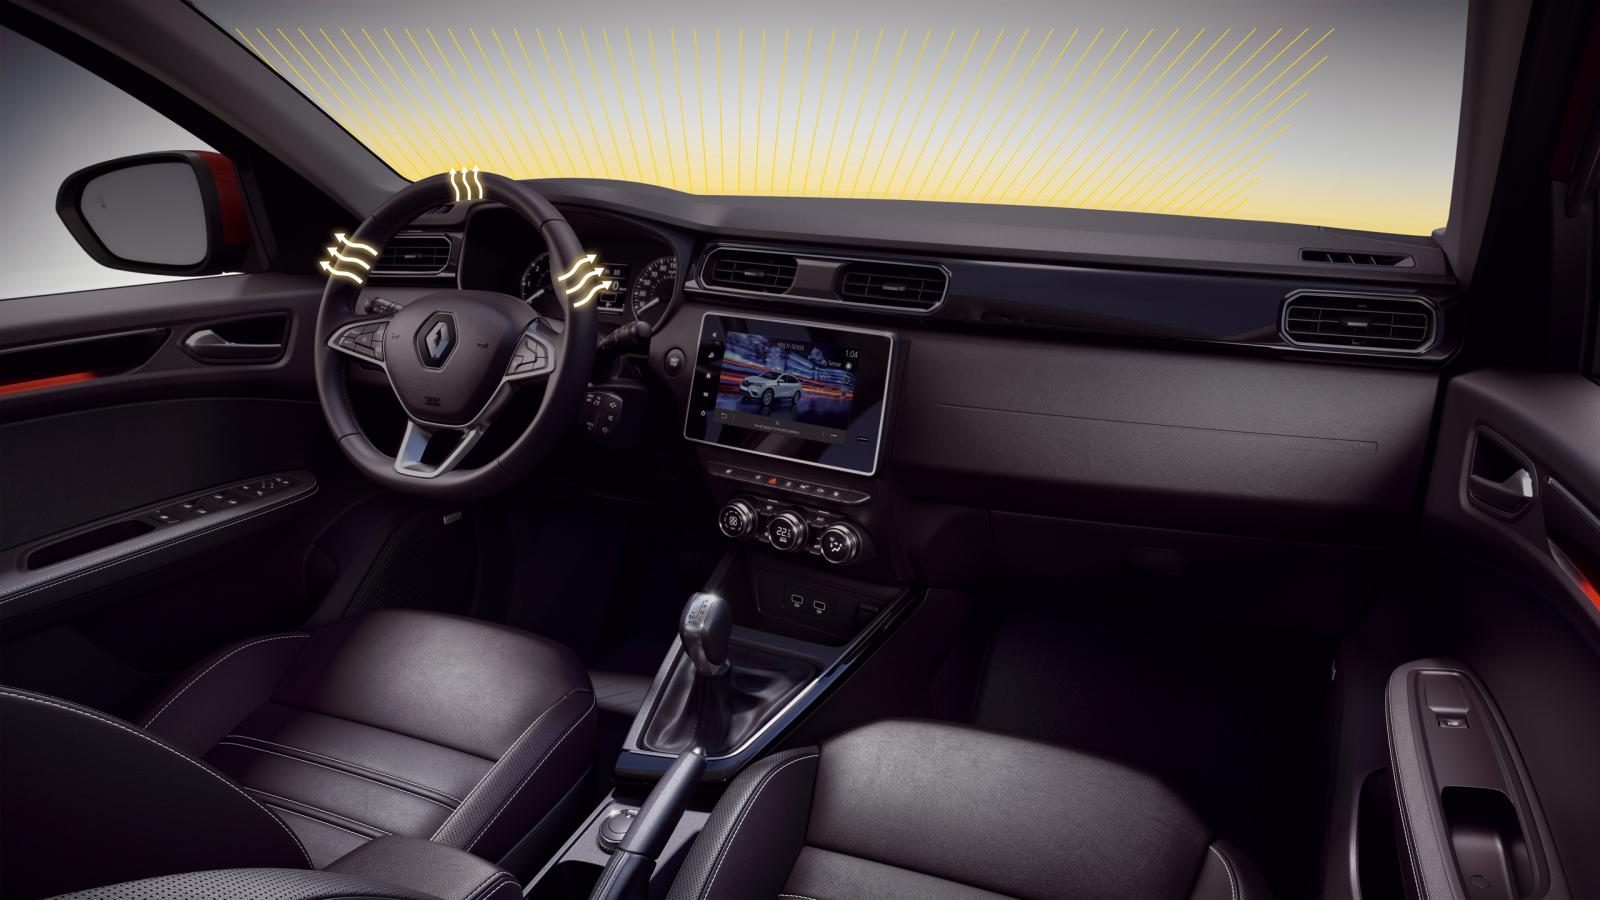 НОВИЙ Renault ARKANA  фото интерьера 1